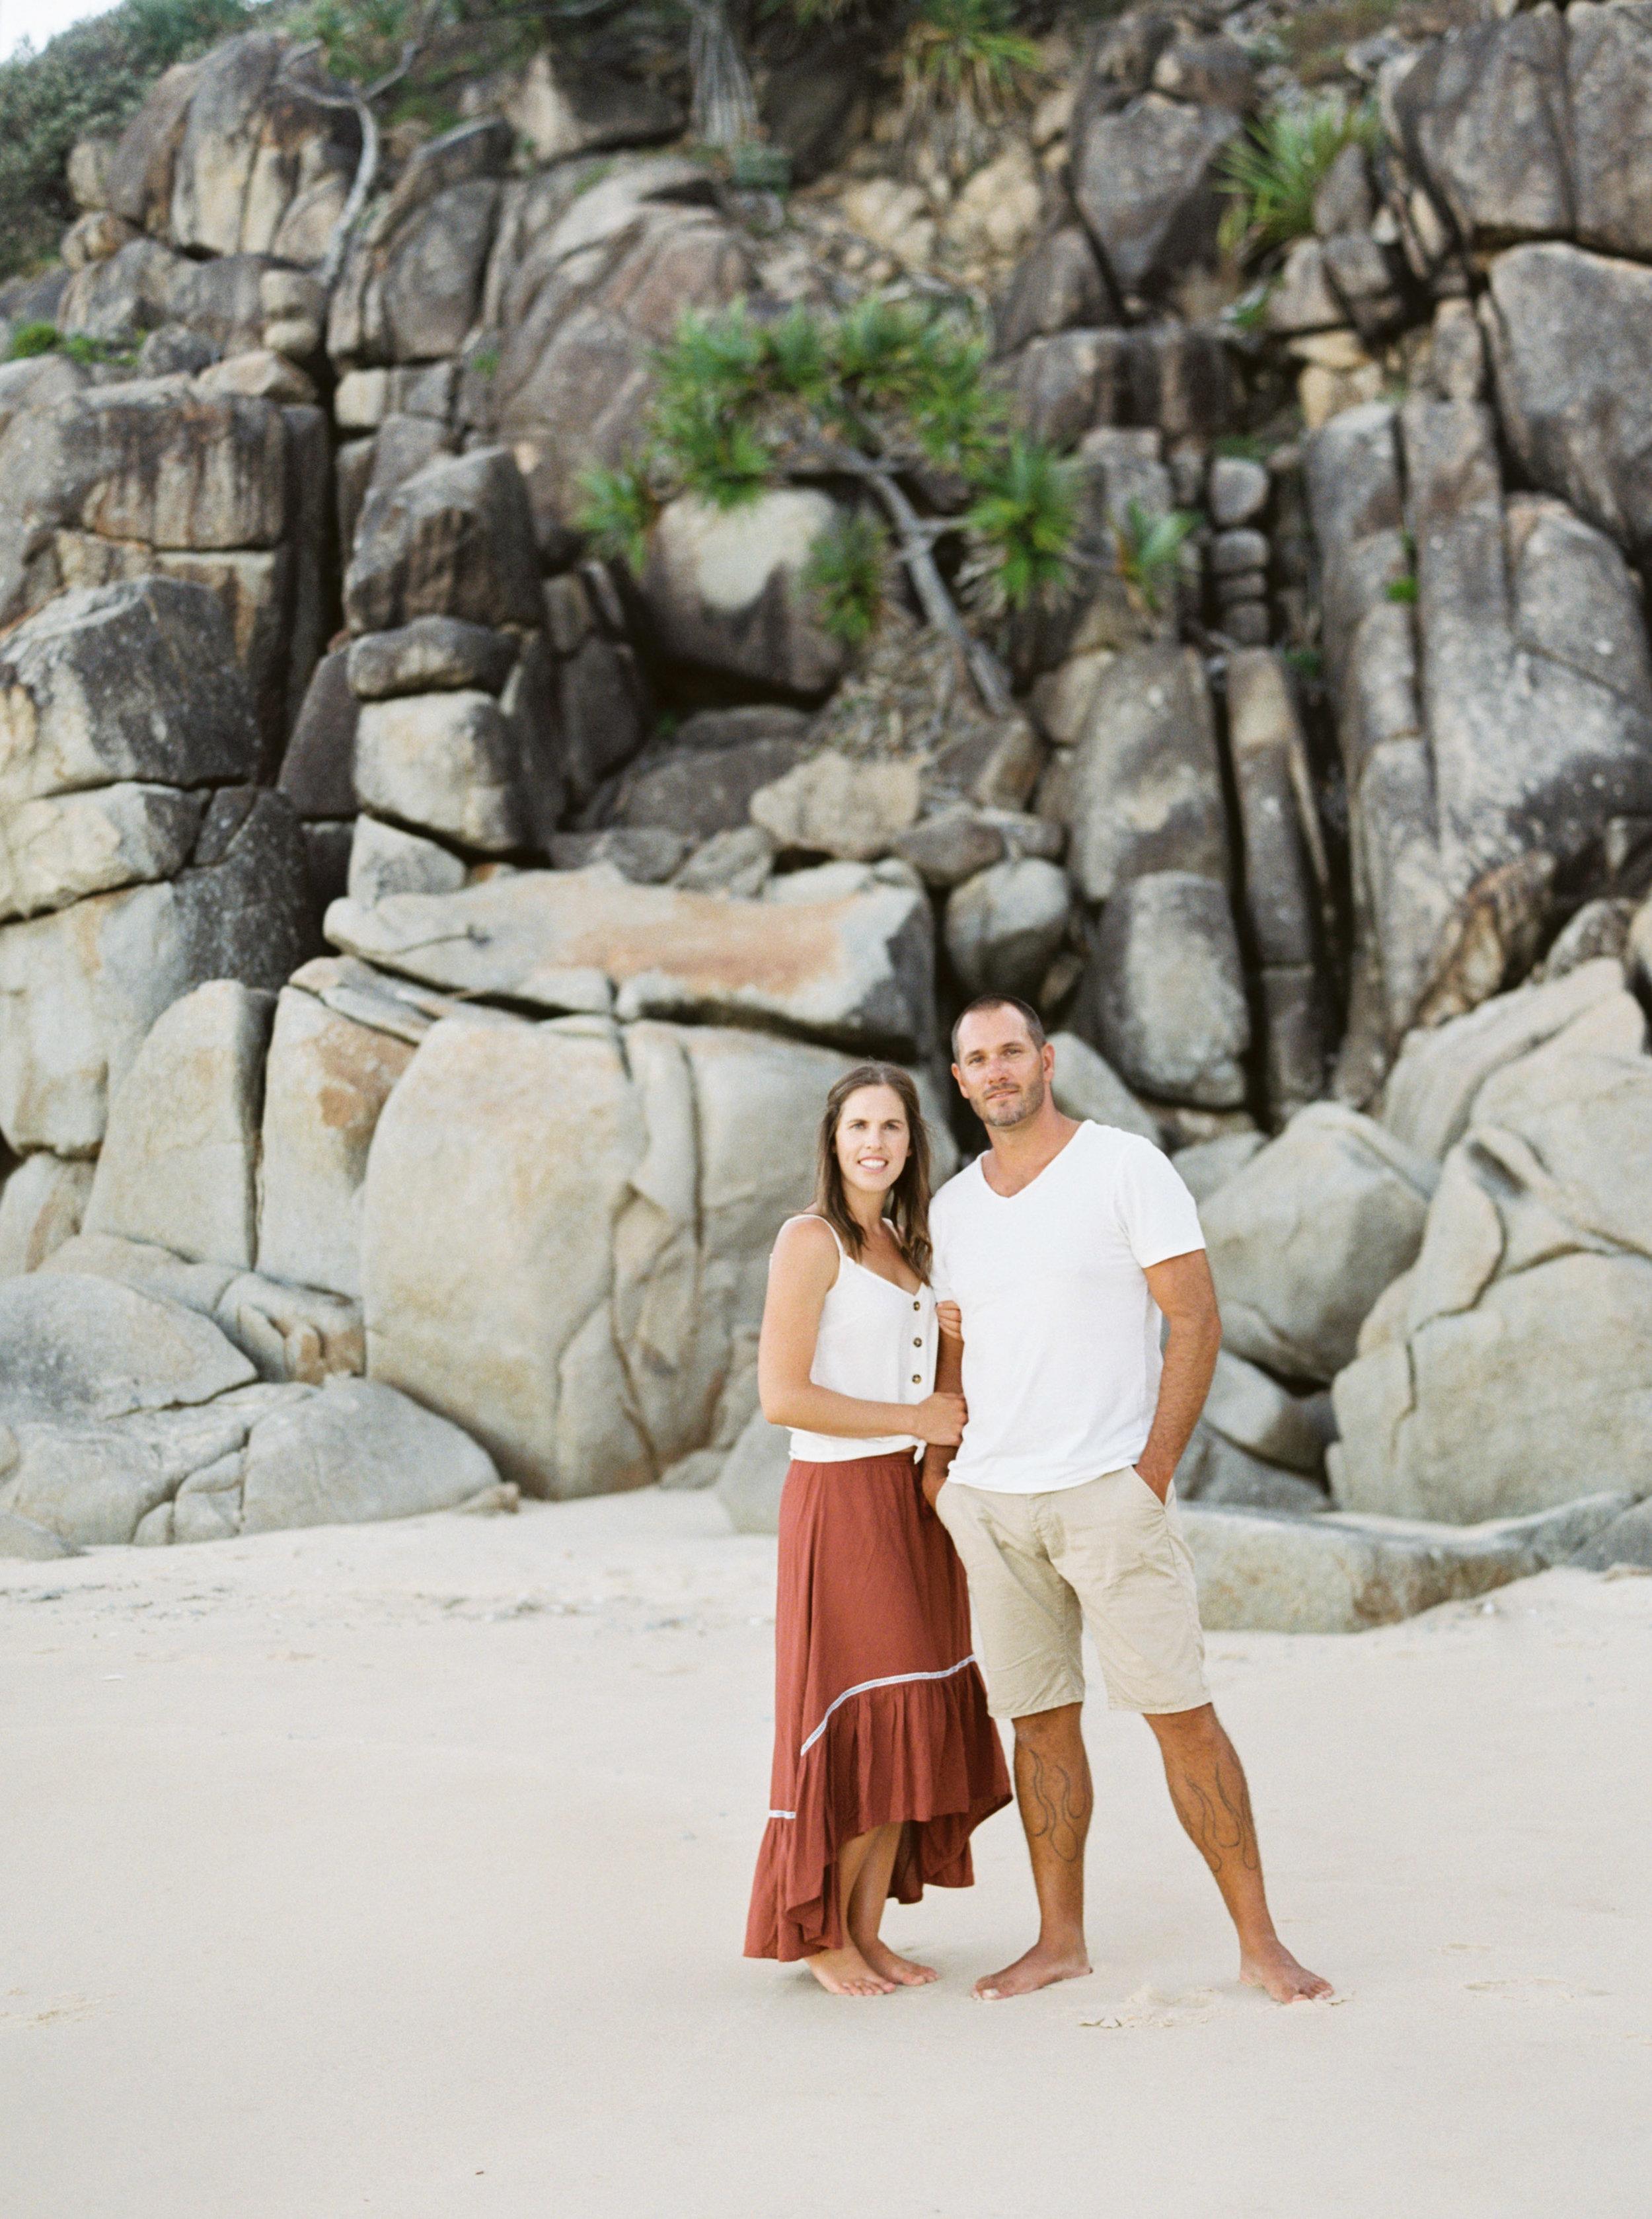 Sheri McMahon Fine Art Film Wedding Photographer Newcastle Central Coast NSW Australia-85.jpg